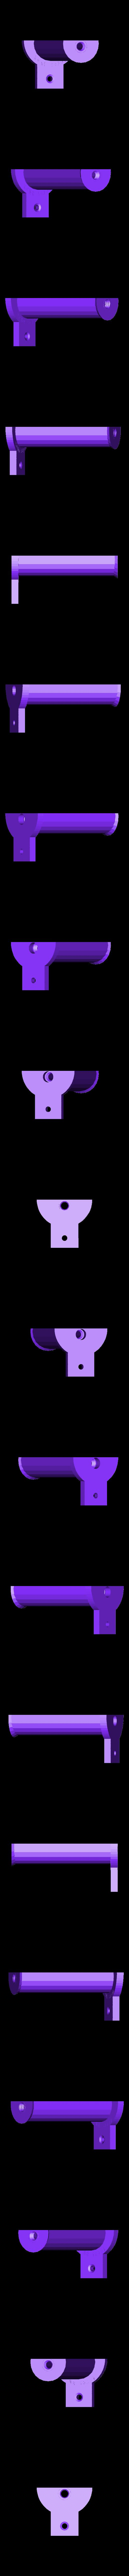 spool_holder.stl Download free STL file Spool holder • 3D print object, ArtesDNet